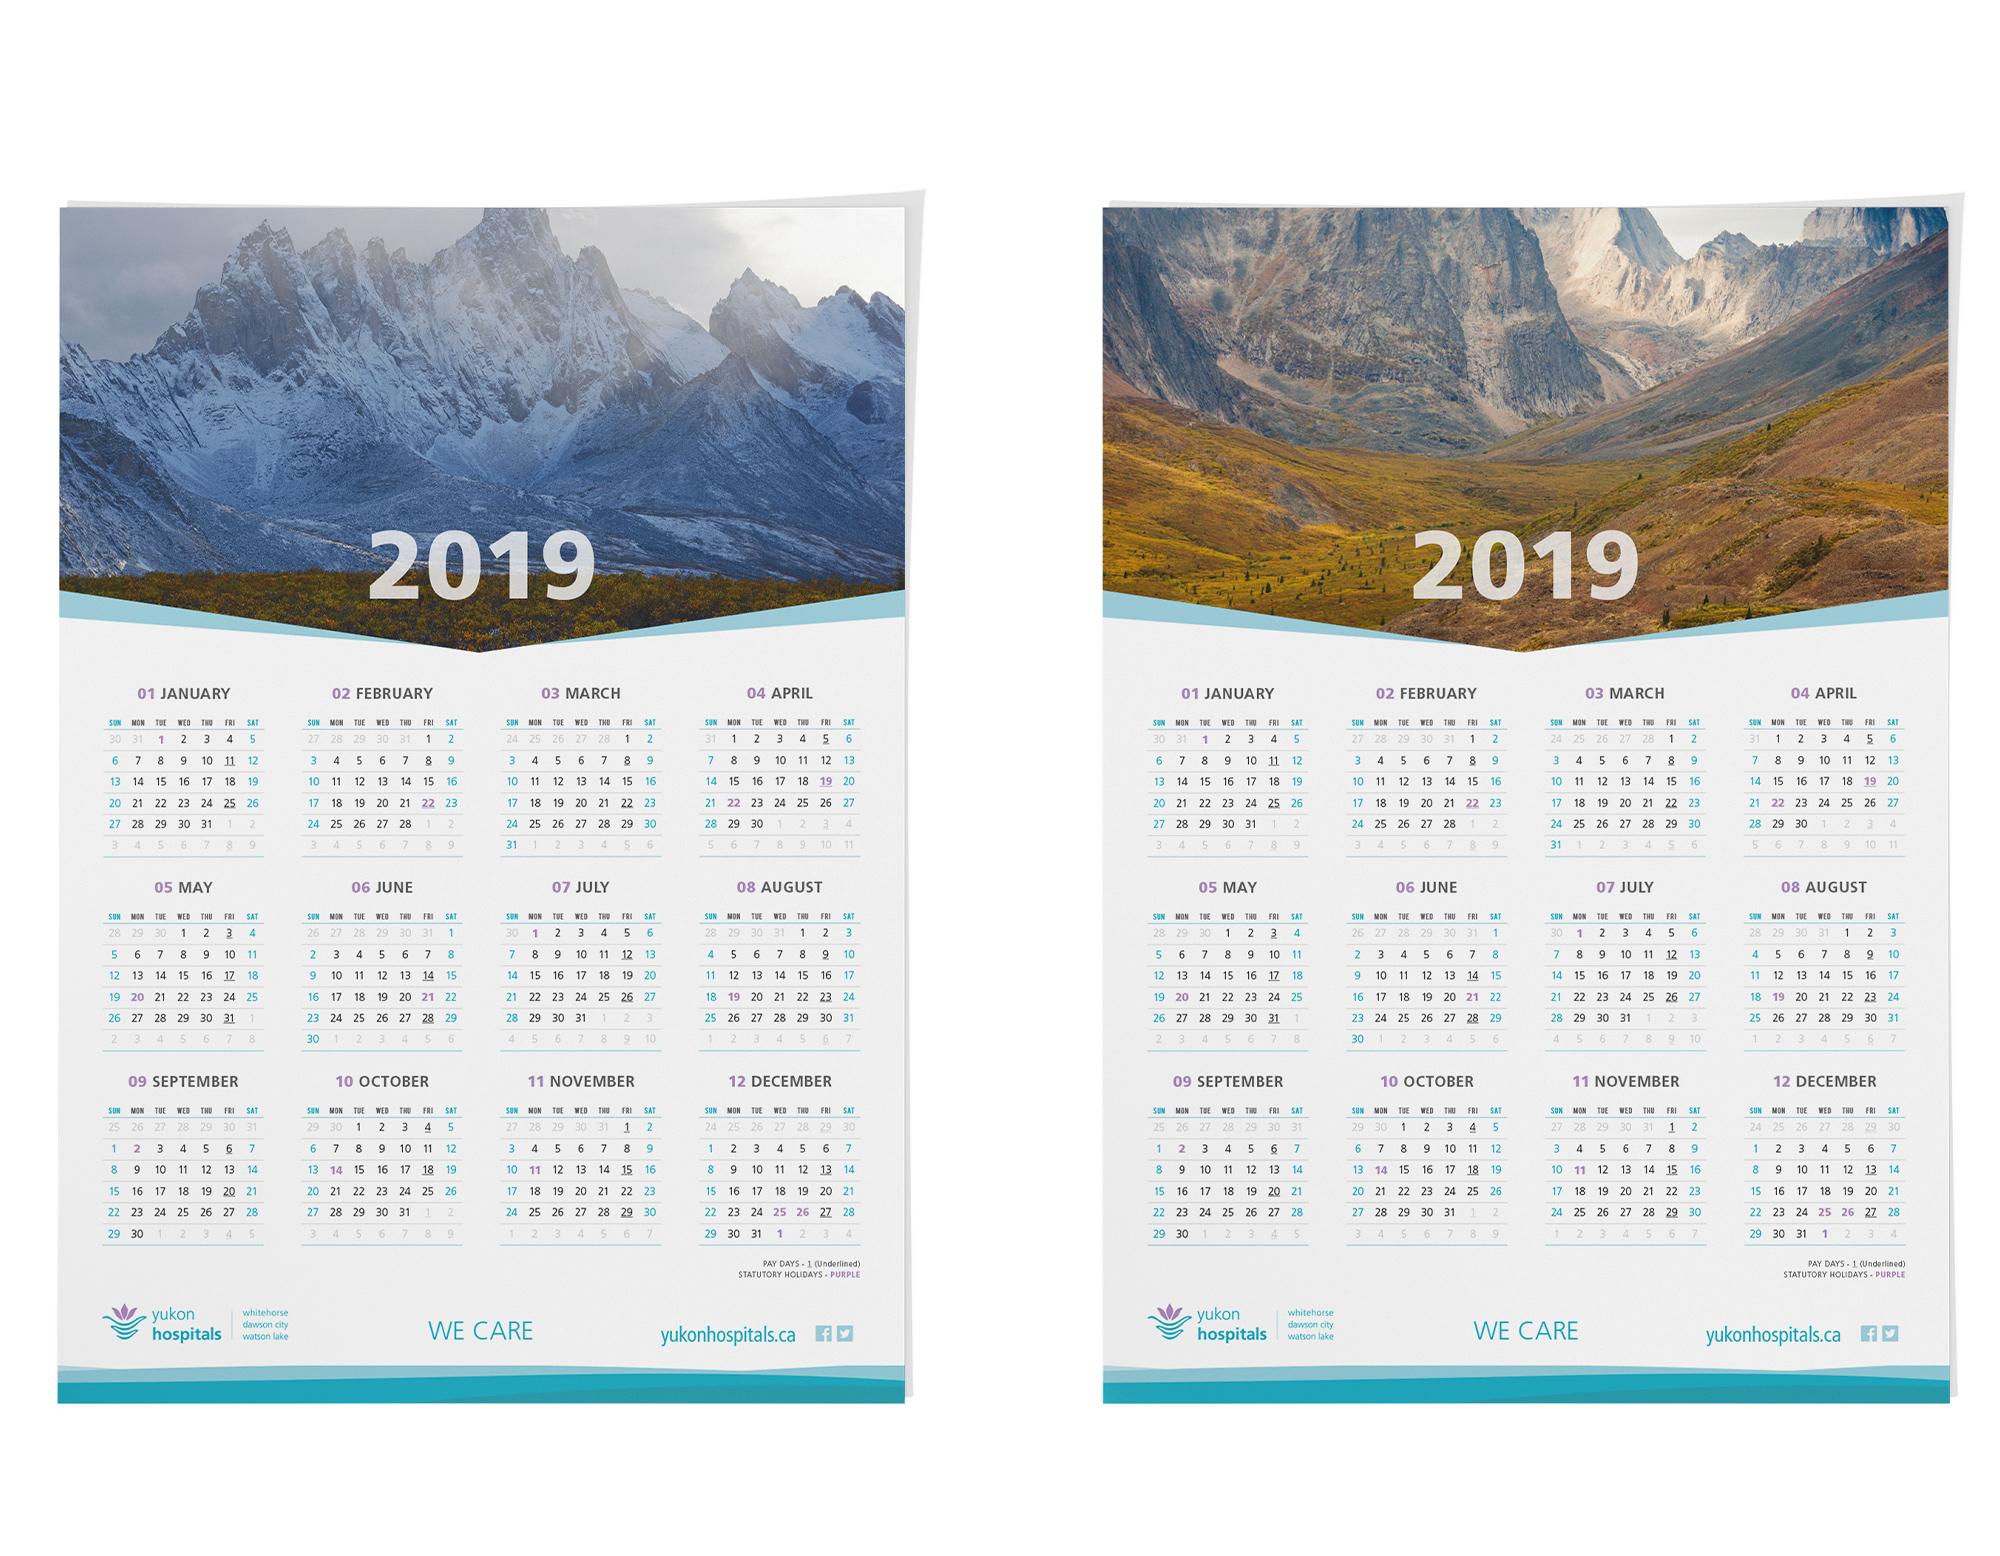 Sample image of 2019 wall calendar for the Yukon Hospital Corporation.